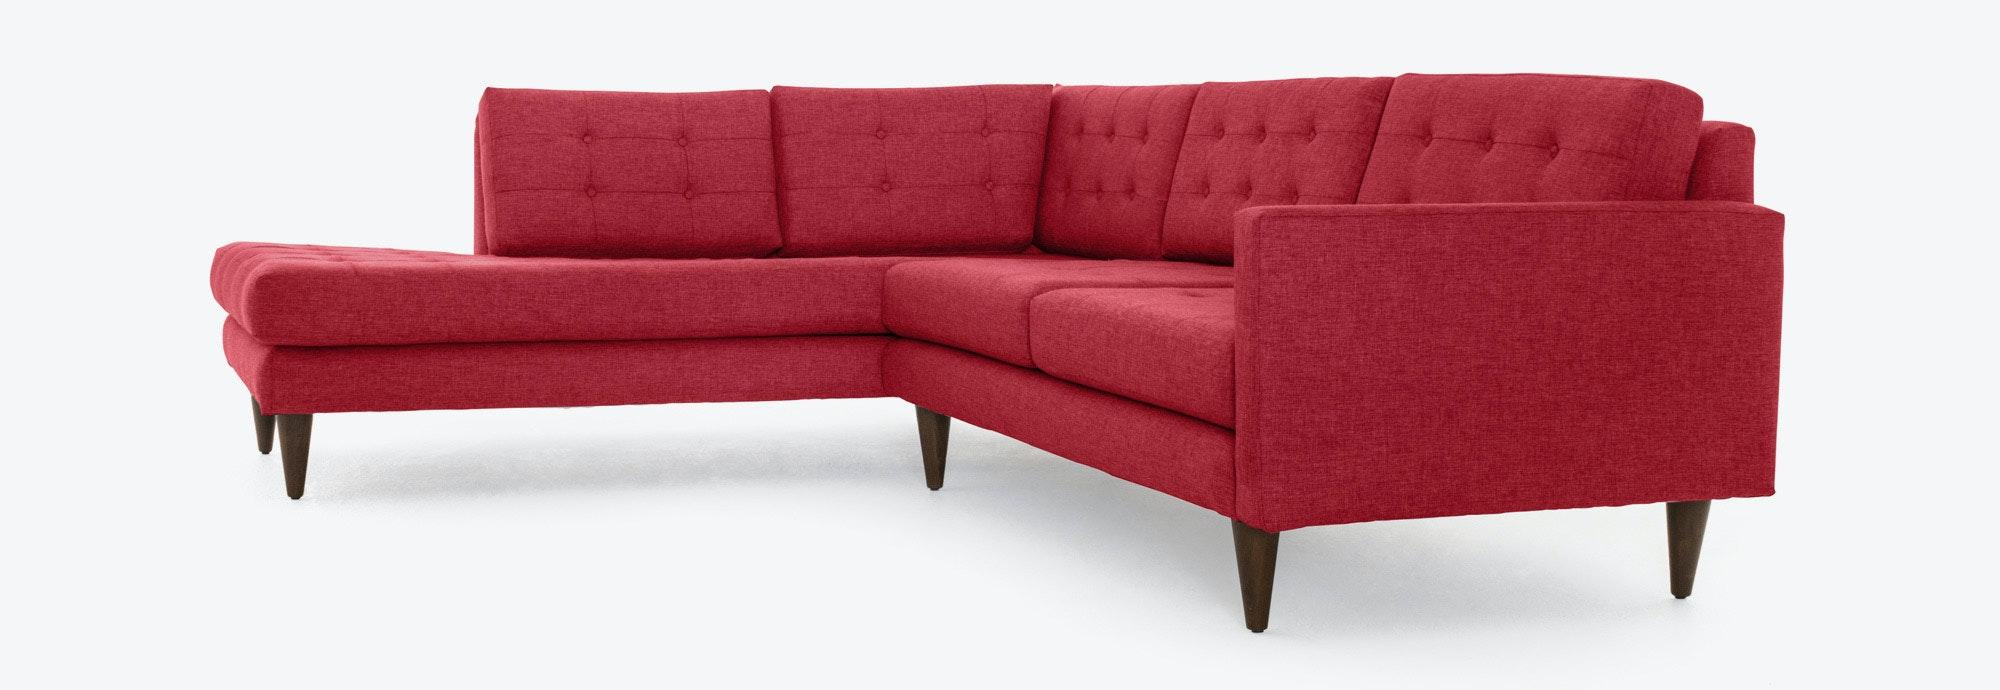 Eliot Sectional With Bumper Joybird ~ Mid Century Chaise Sofa